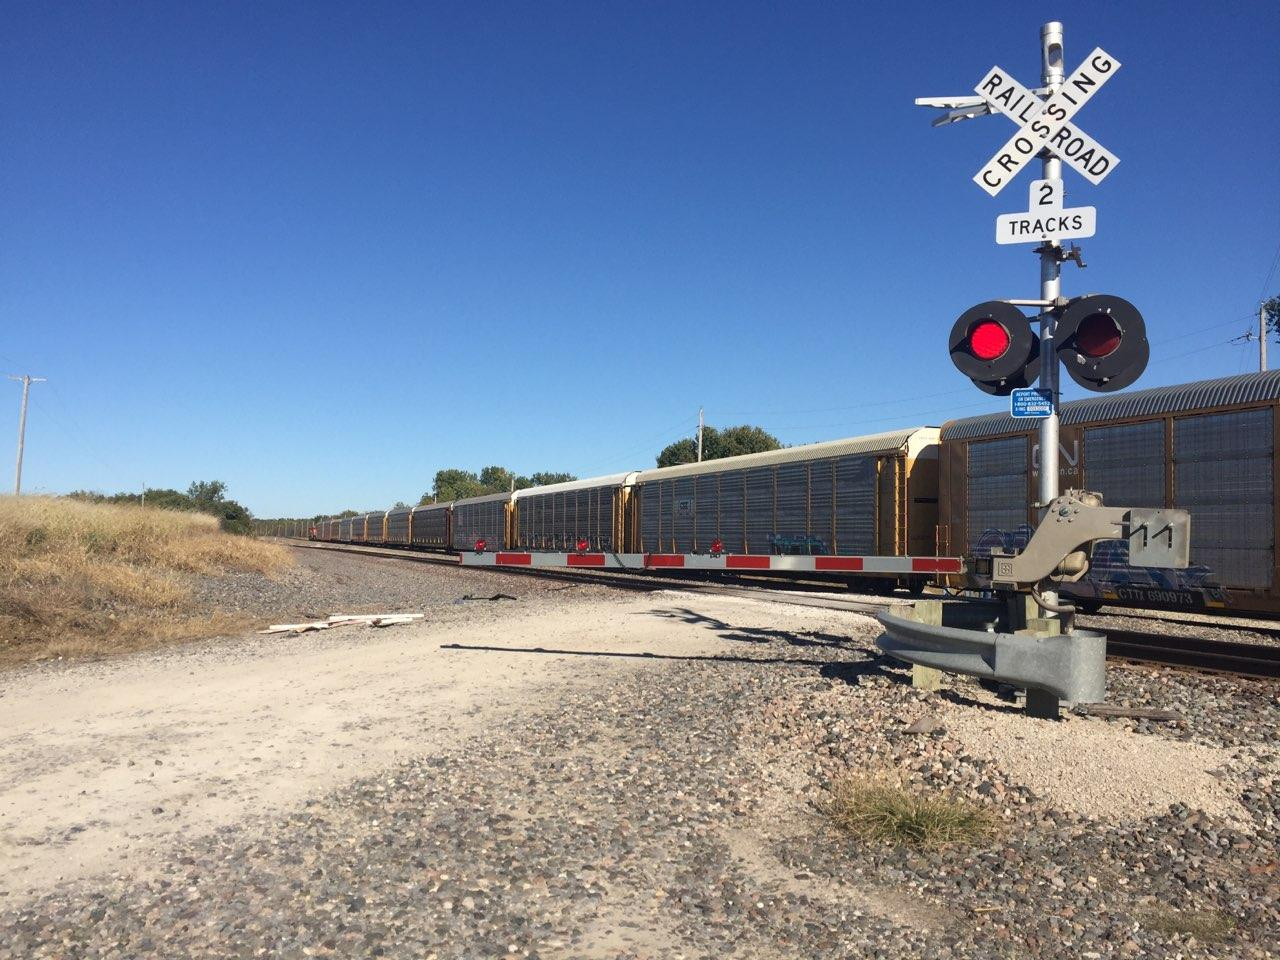 BREAKING:  Motor vehicle wreck at train tracks near Standish